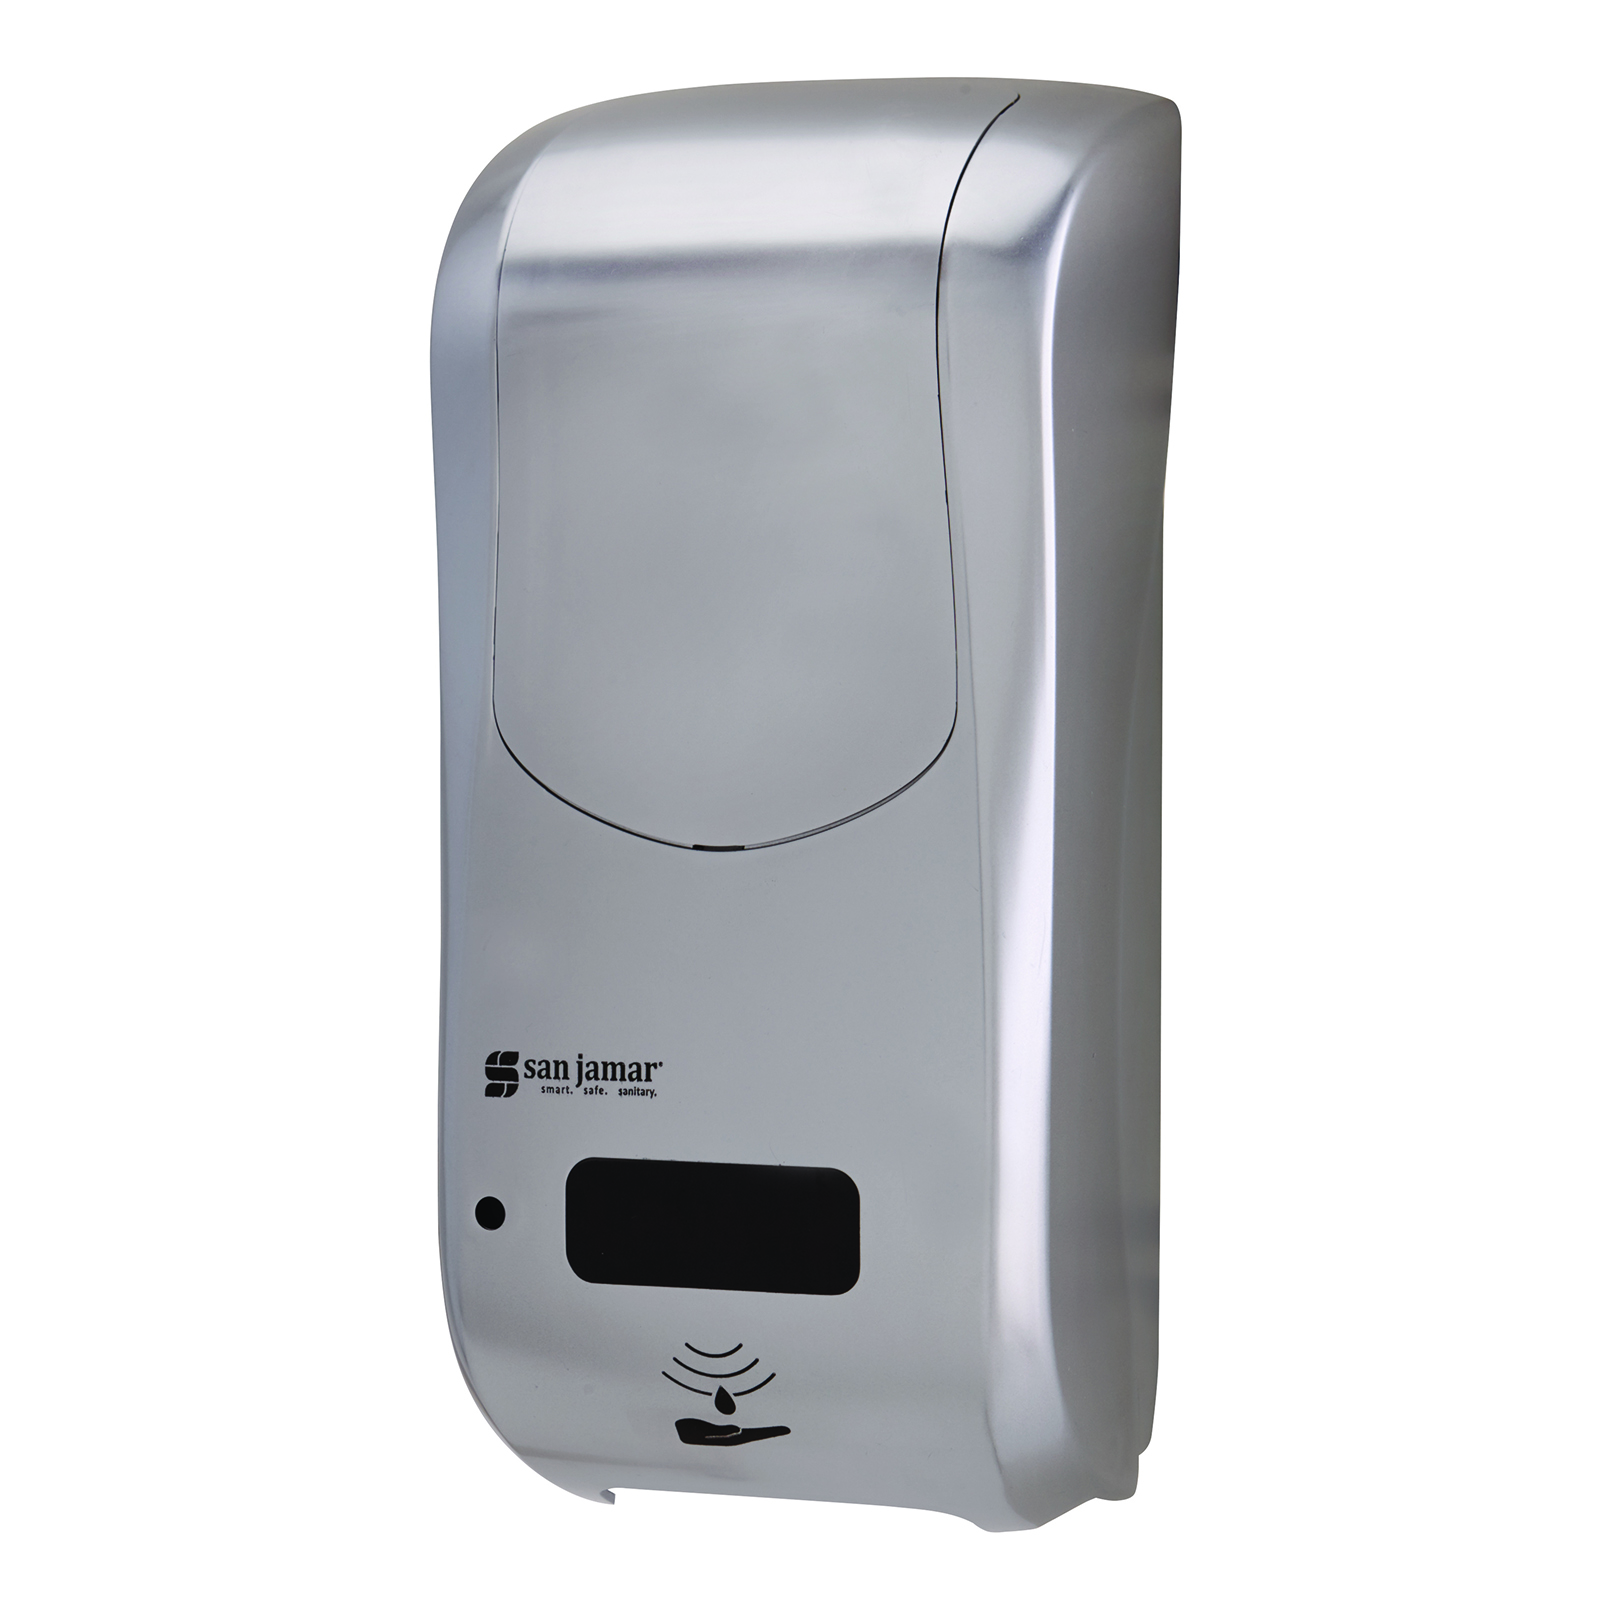 San Jamar SH970SS hand soap / sanitizer dispenser